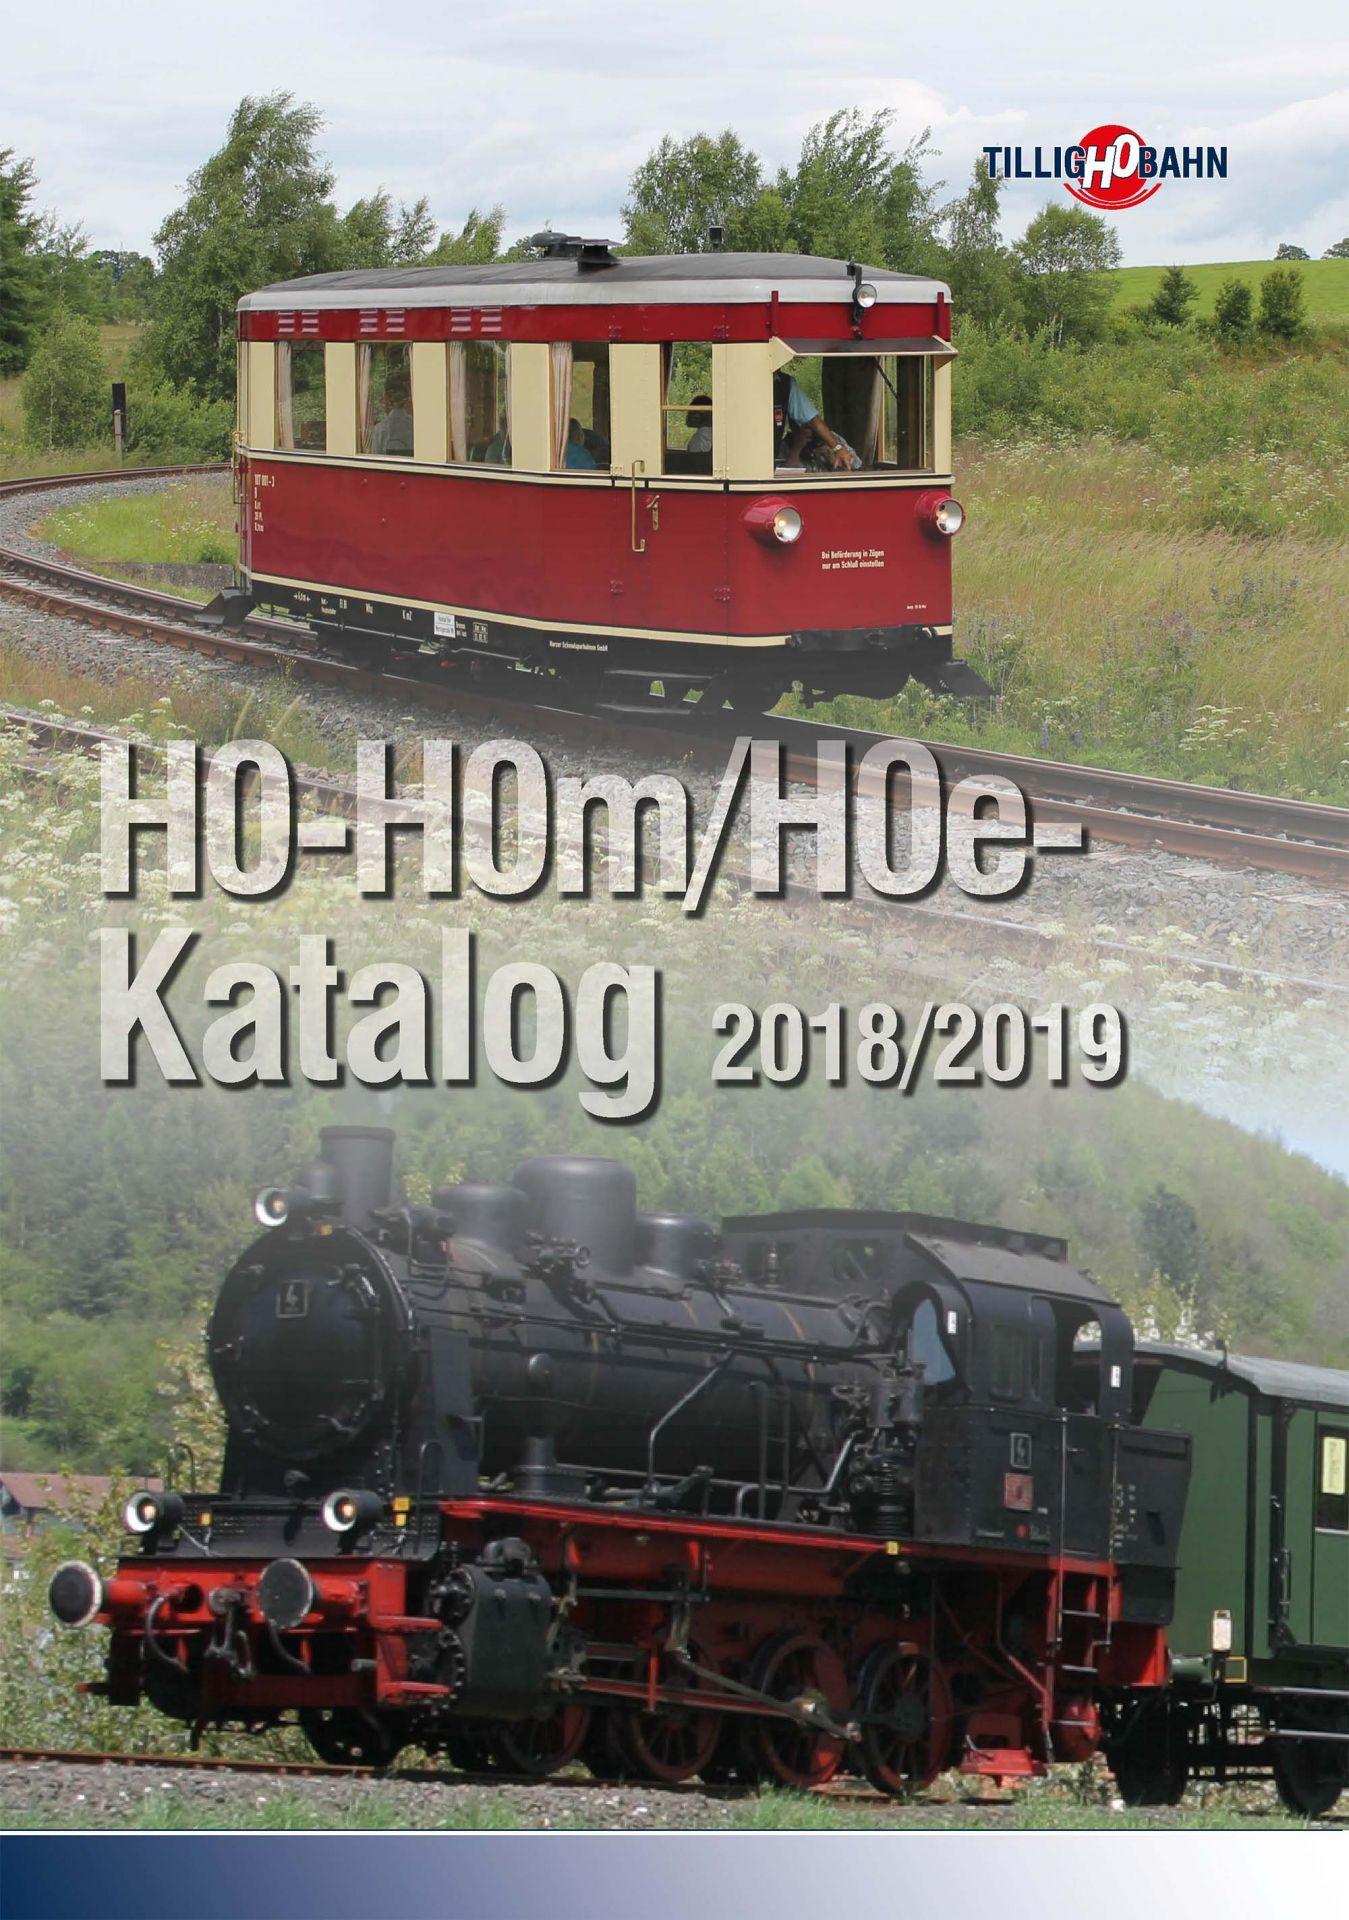 H0-H0m/H0e-Katalog 2018/2019